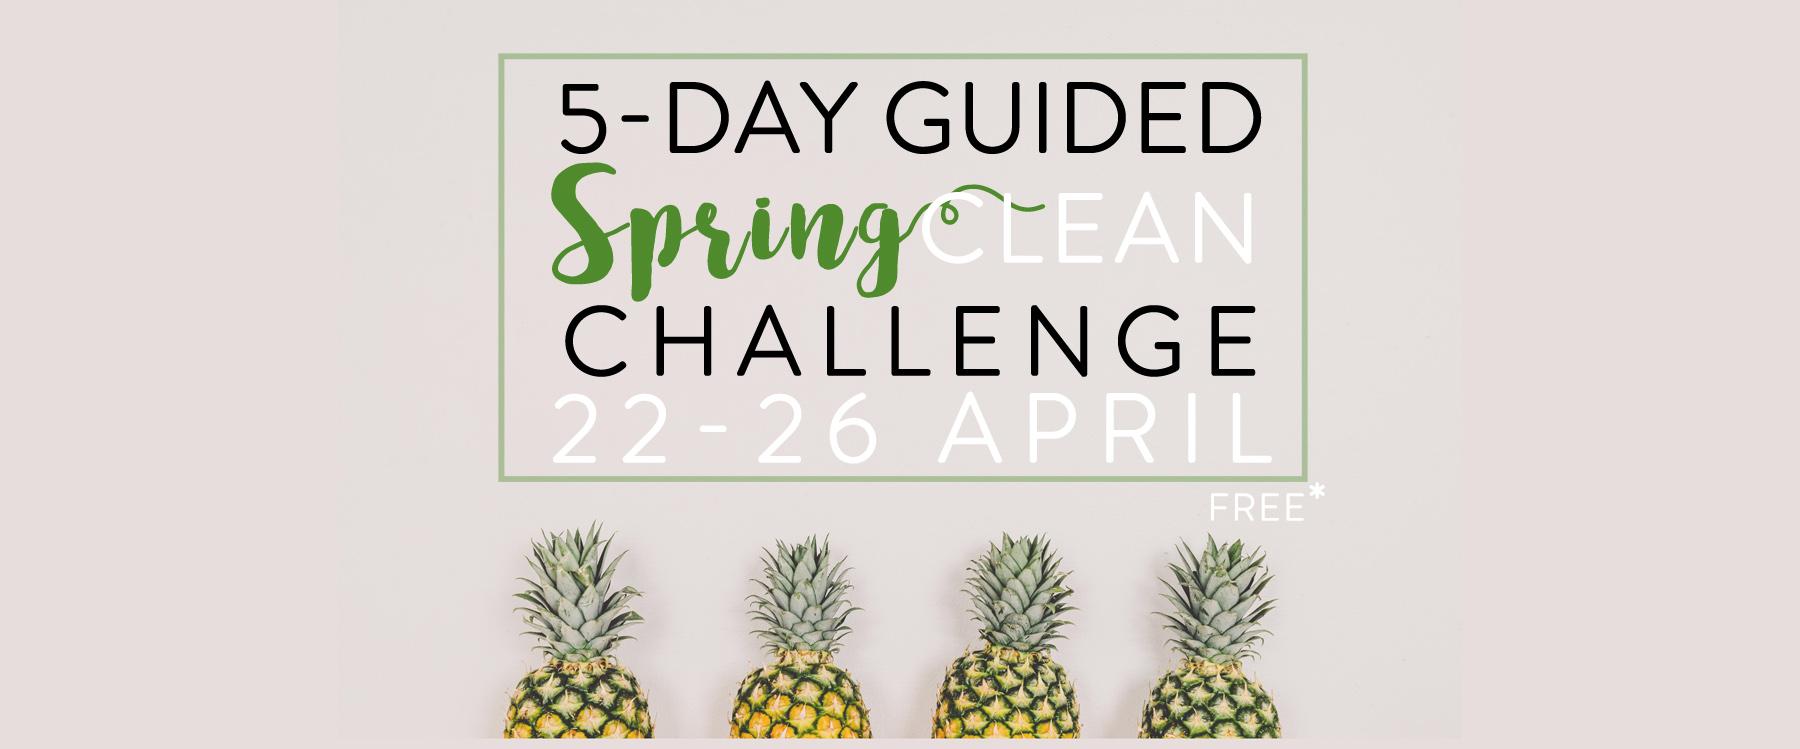 free-spring-clean-health-challenge-april